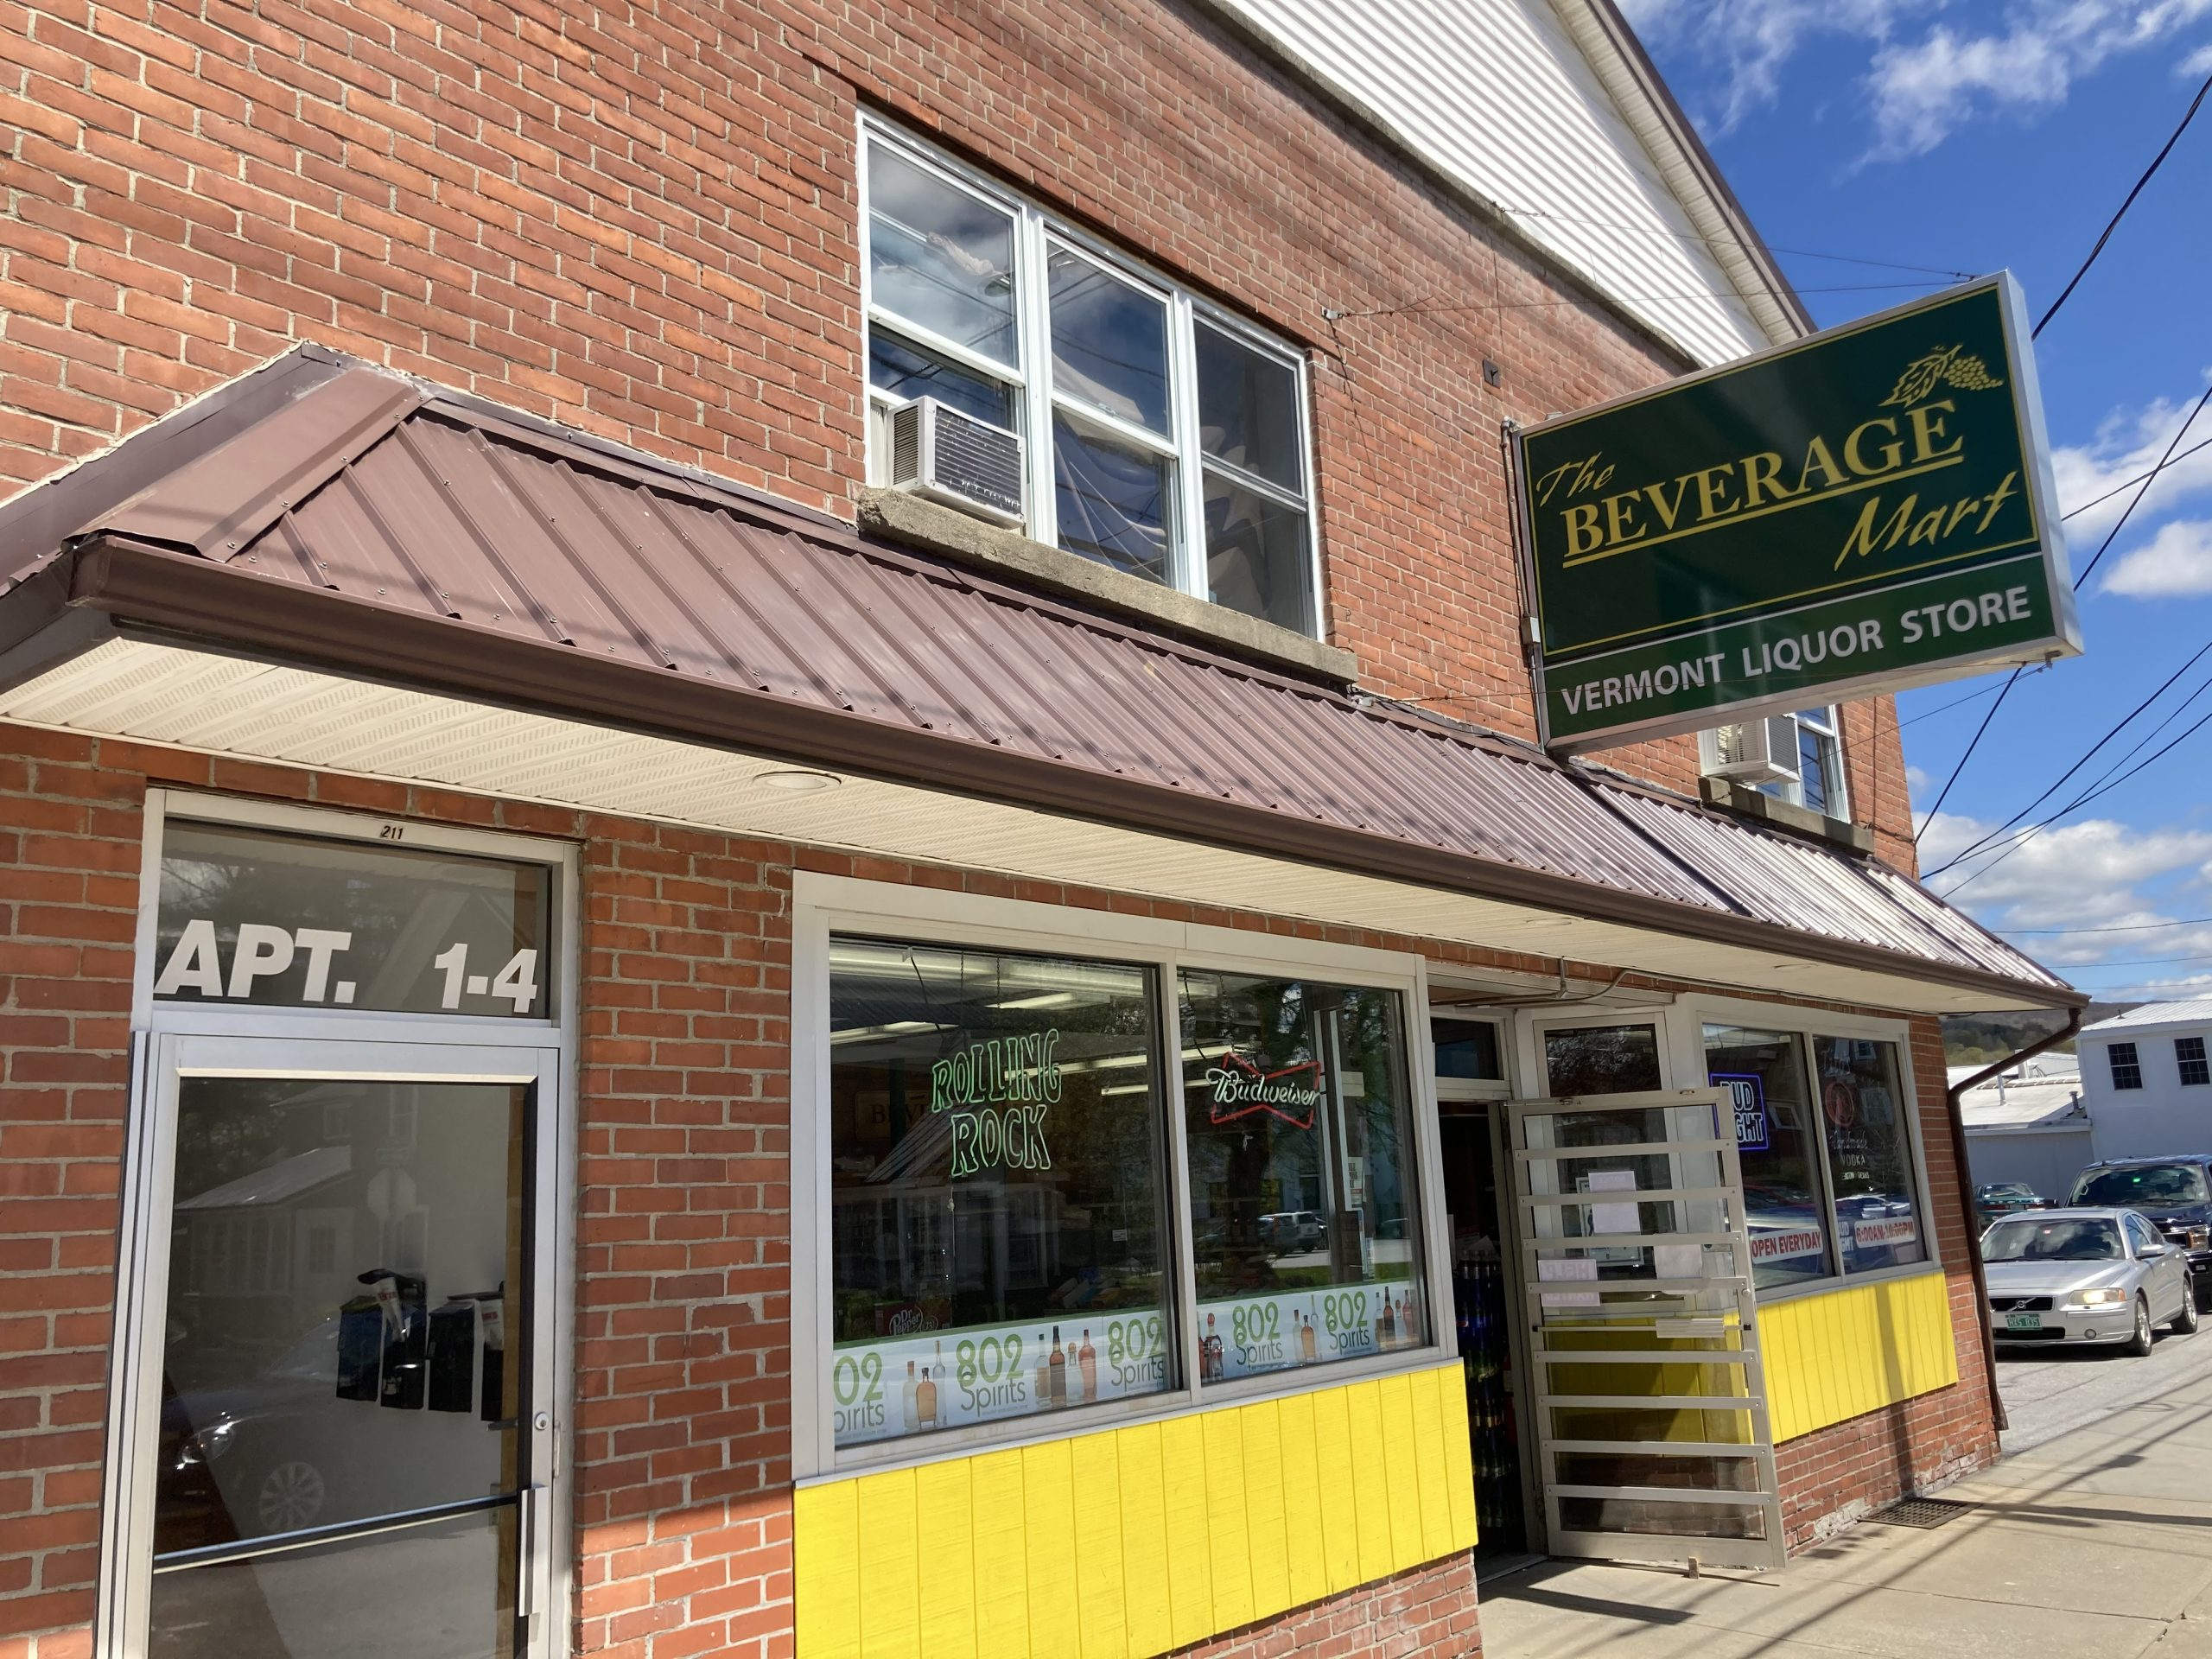 The Beverage Mart, Liquor Store in St. Albans, VT